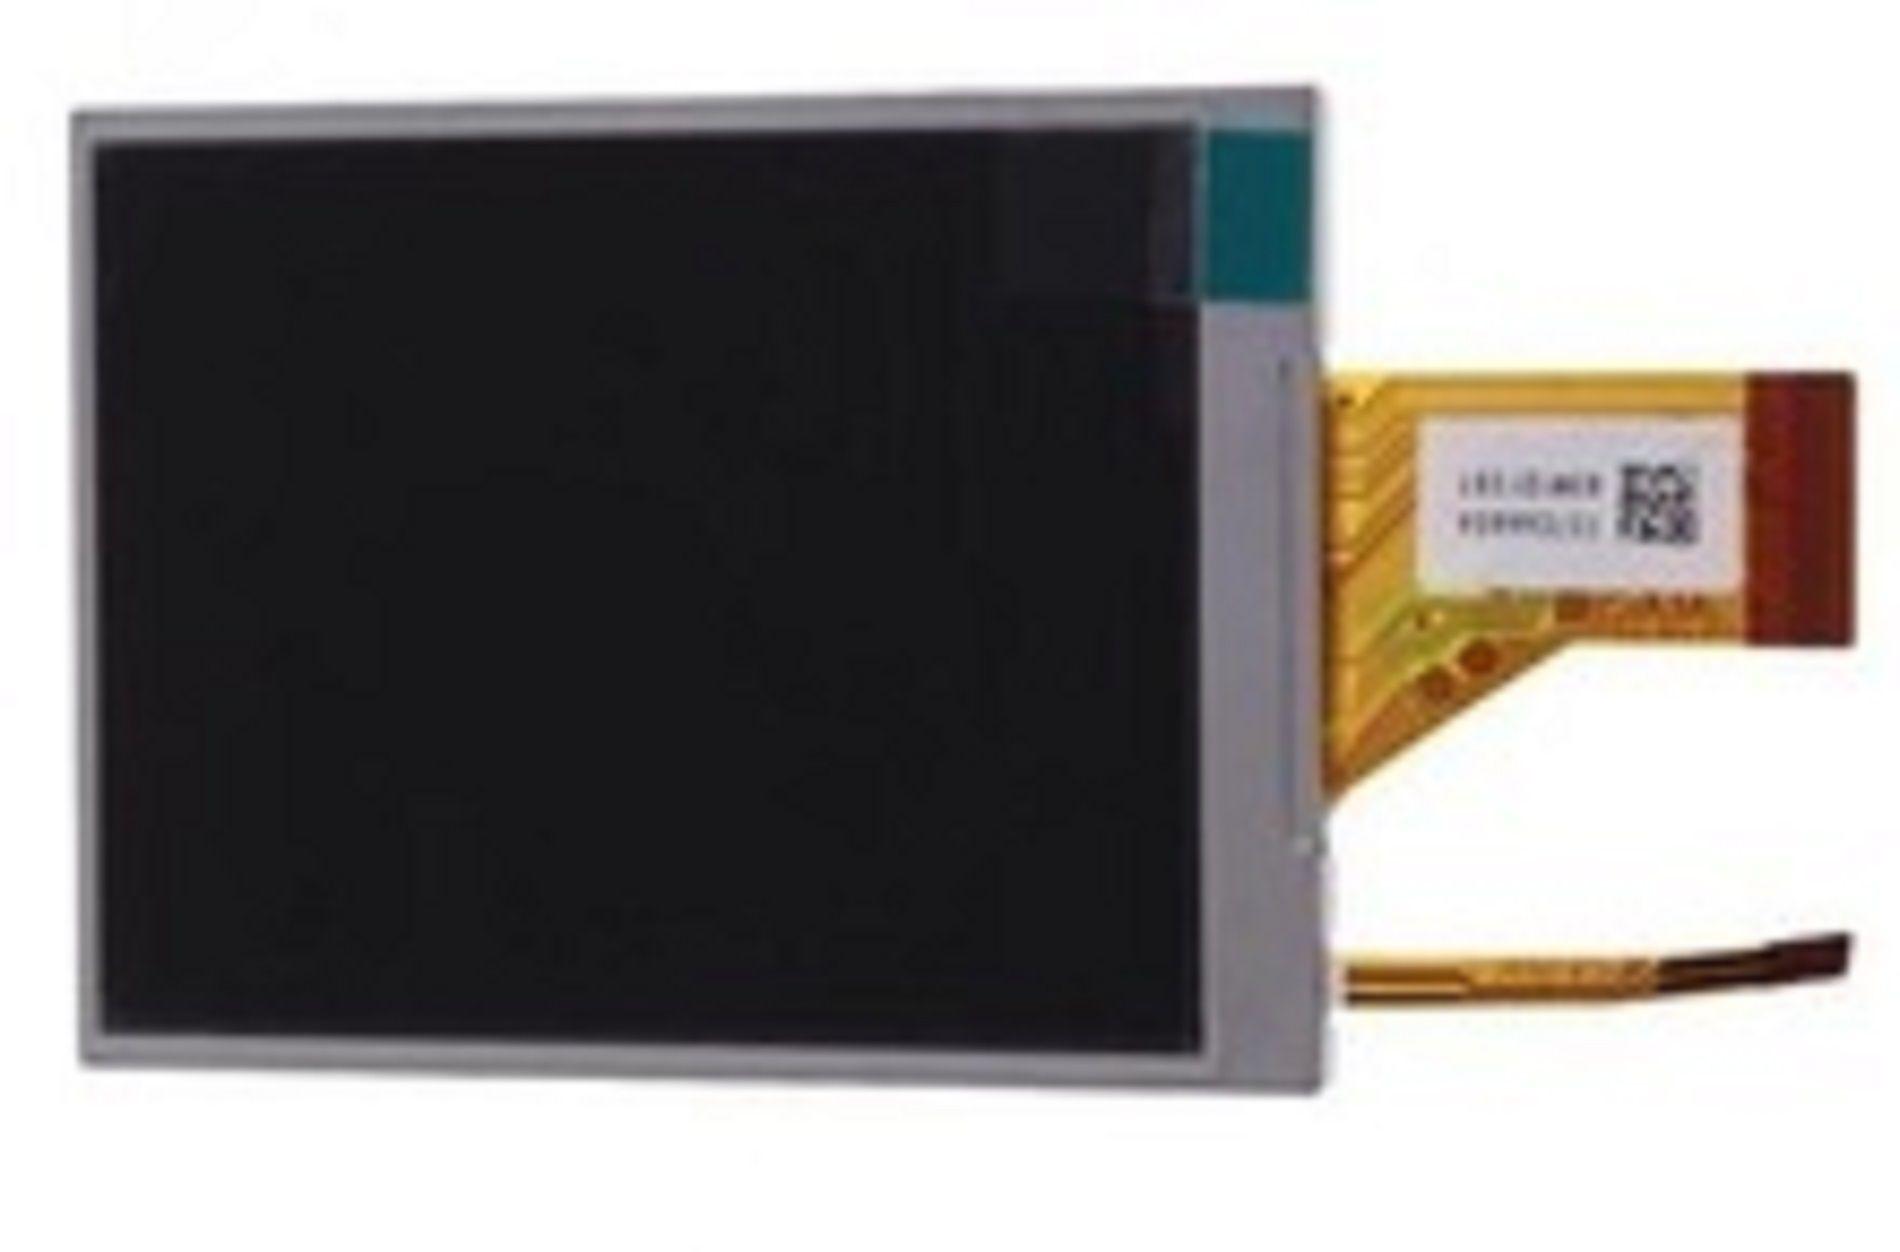 Display Lcd para Nikon D5000, P80, S560, S620, S630, P6000